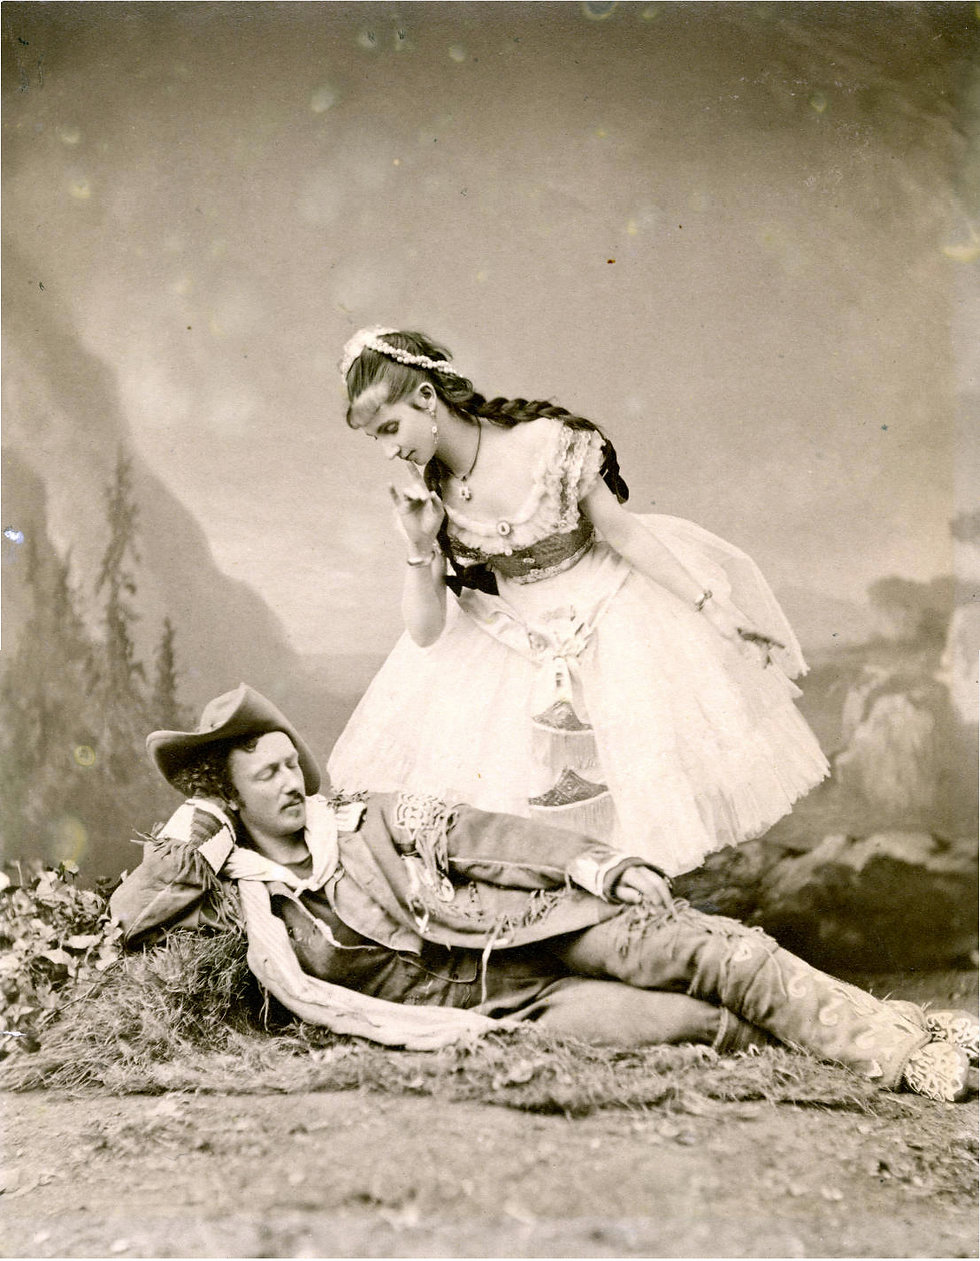 Texas Jack and Giuseppina Morlacchi